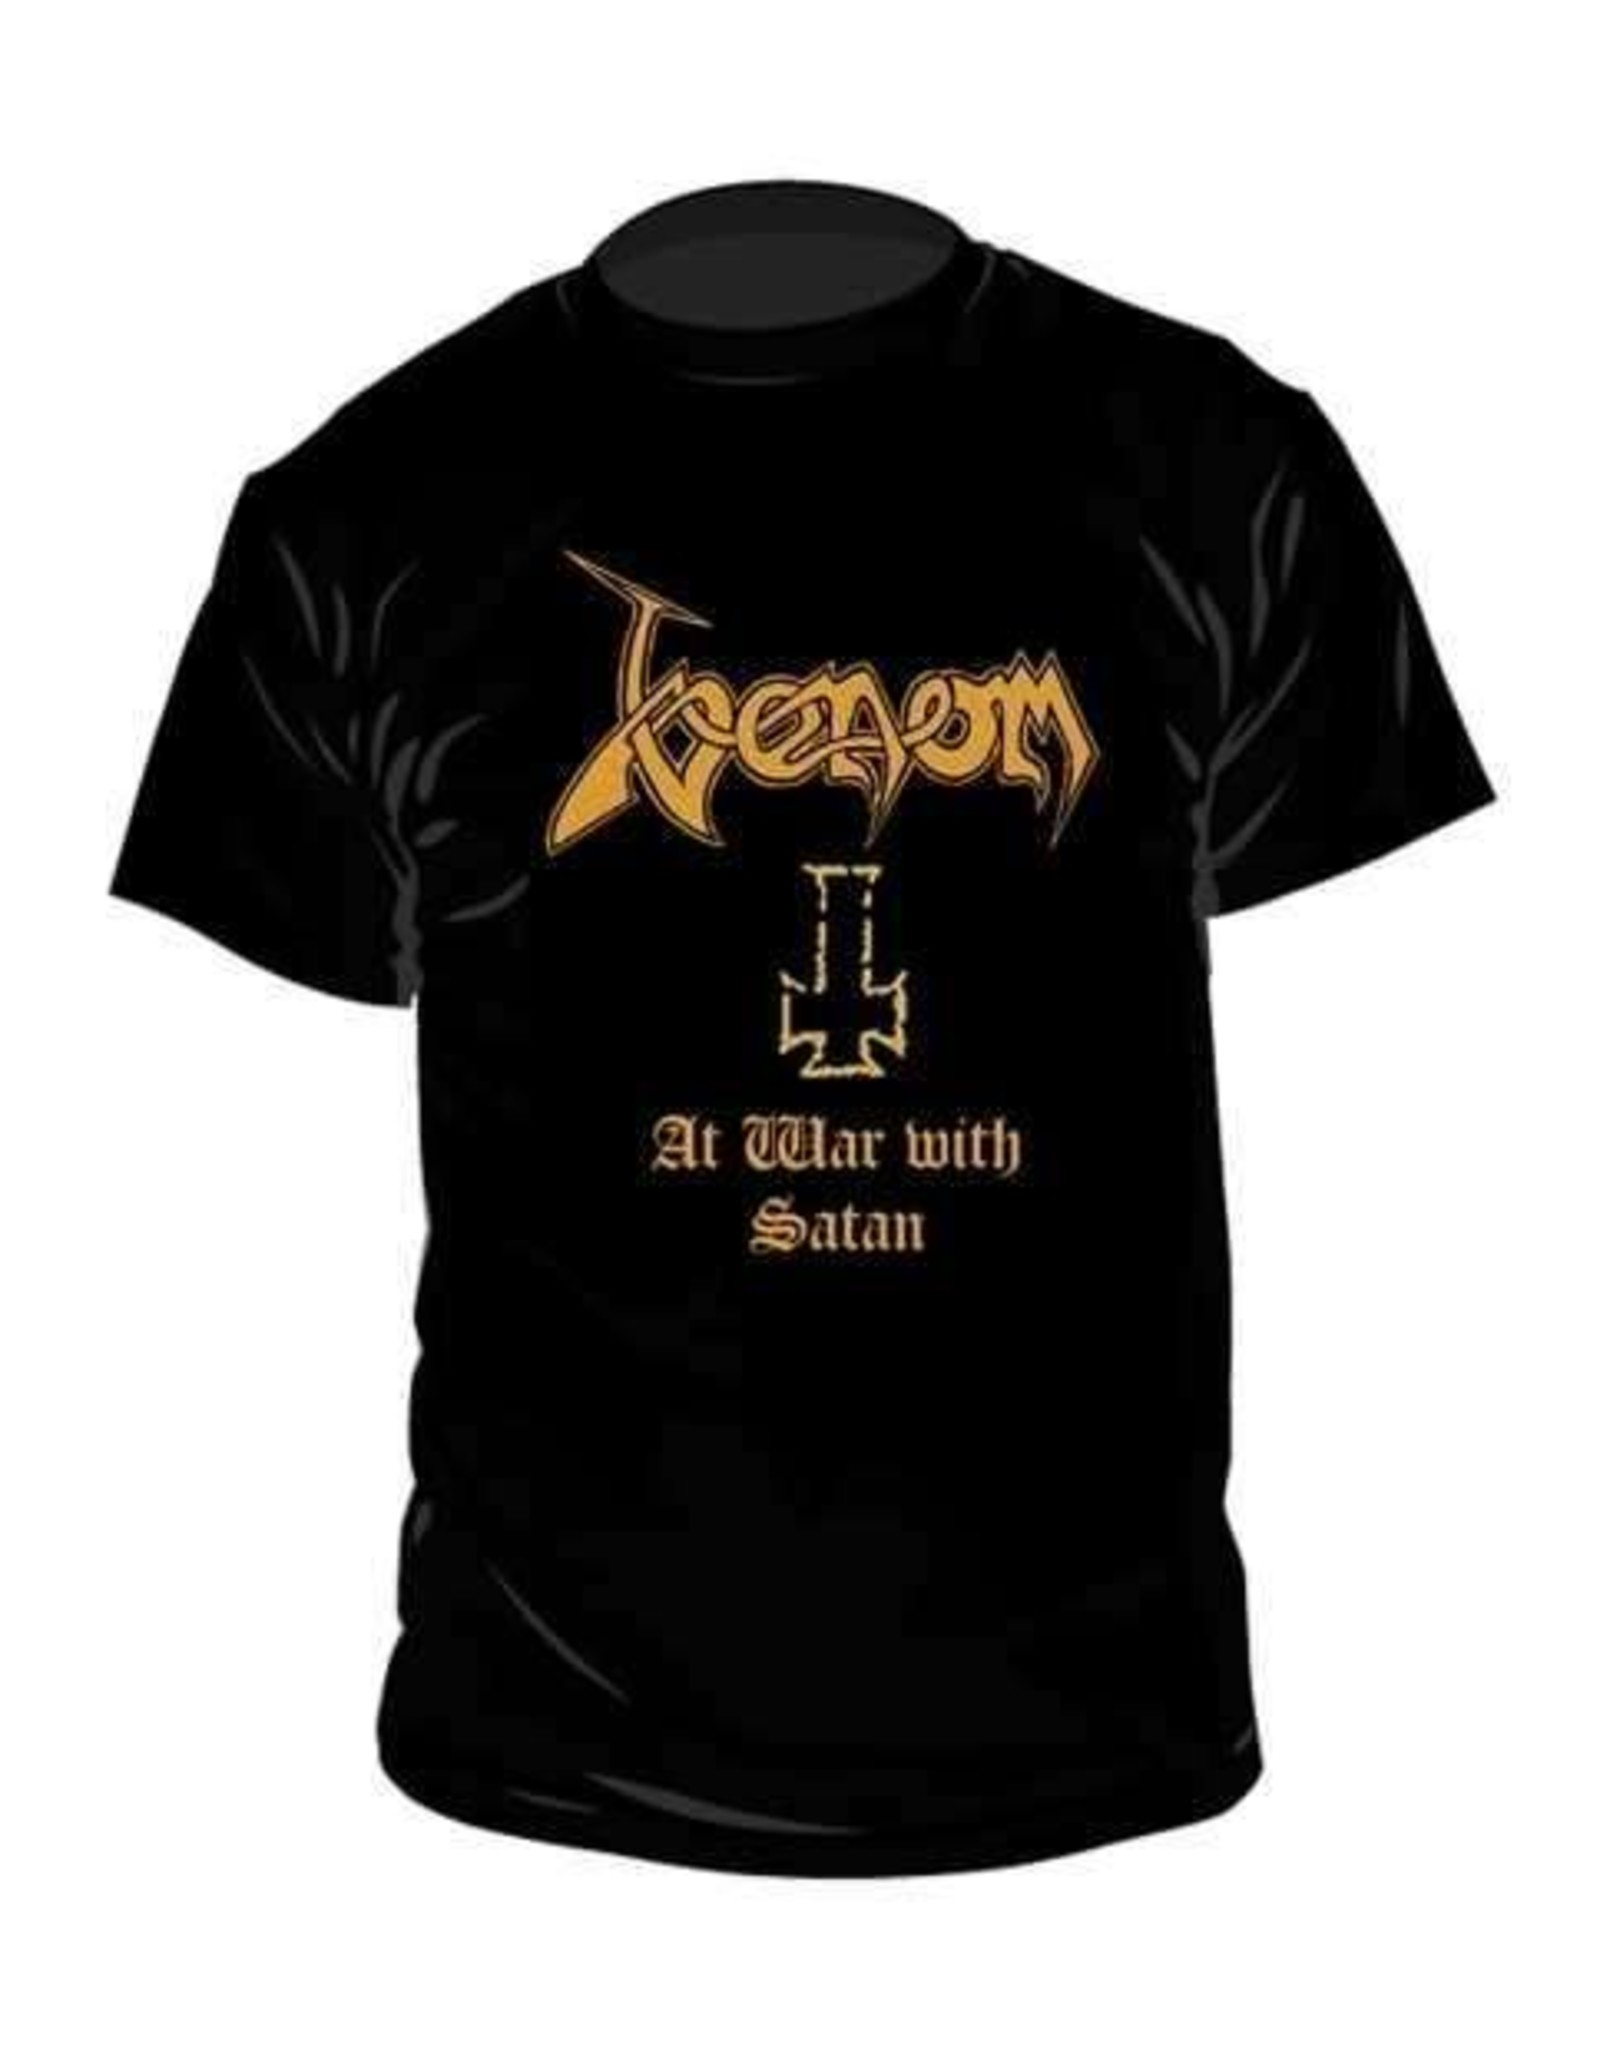 Venom At War With Satan T-Shirt